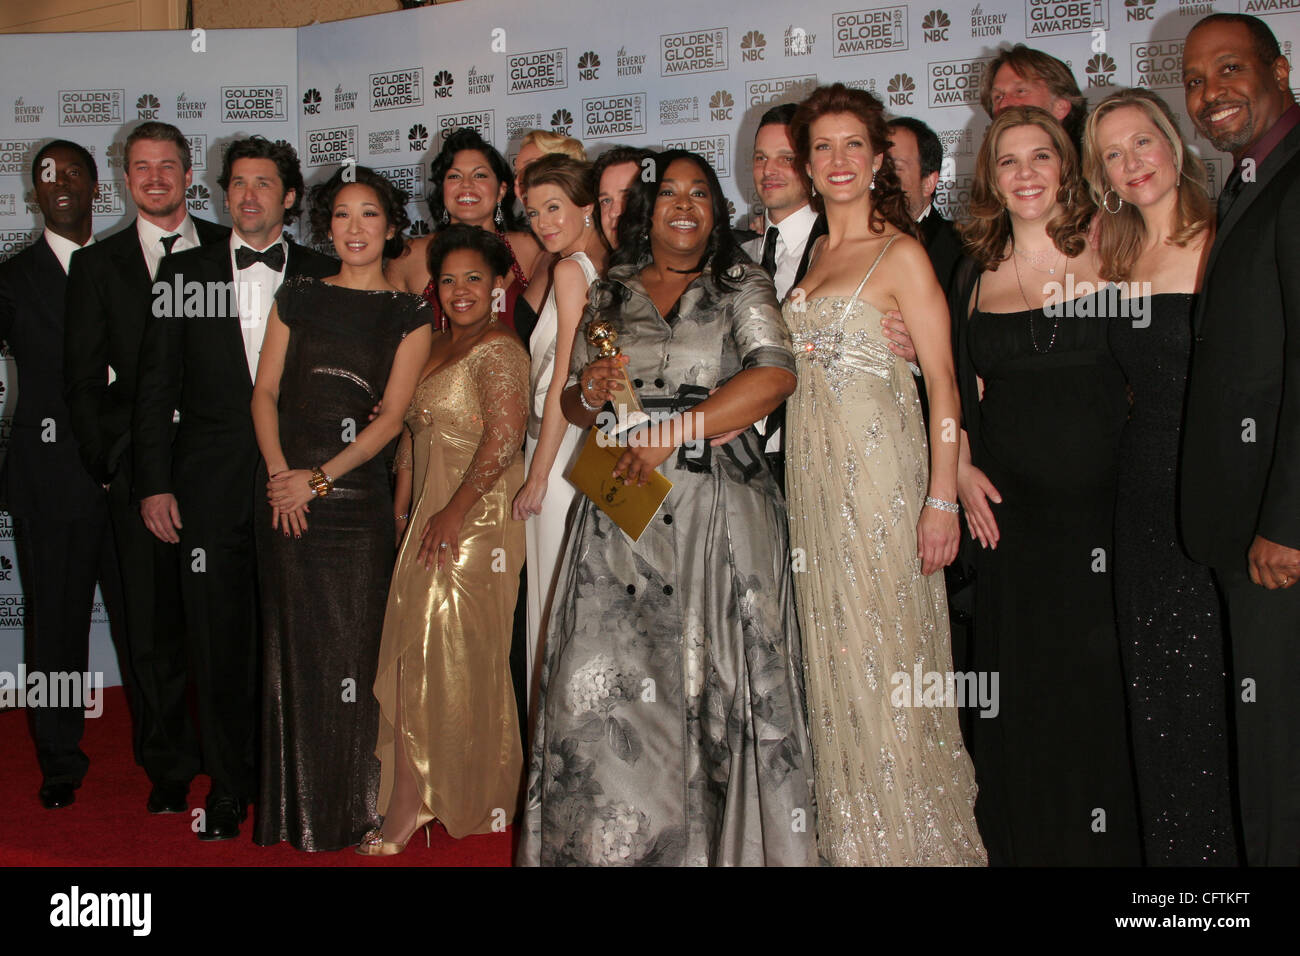 Television Cast Photo Stockfotos & Television Cast Photo Bilder ...